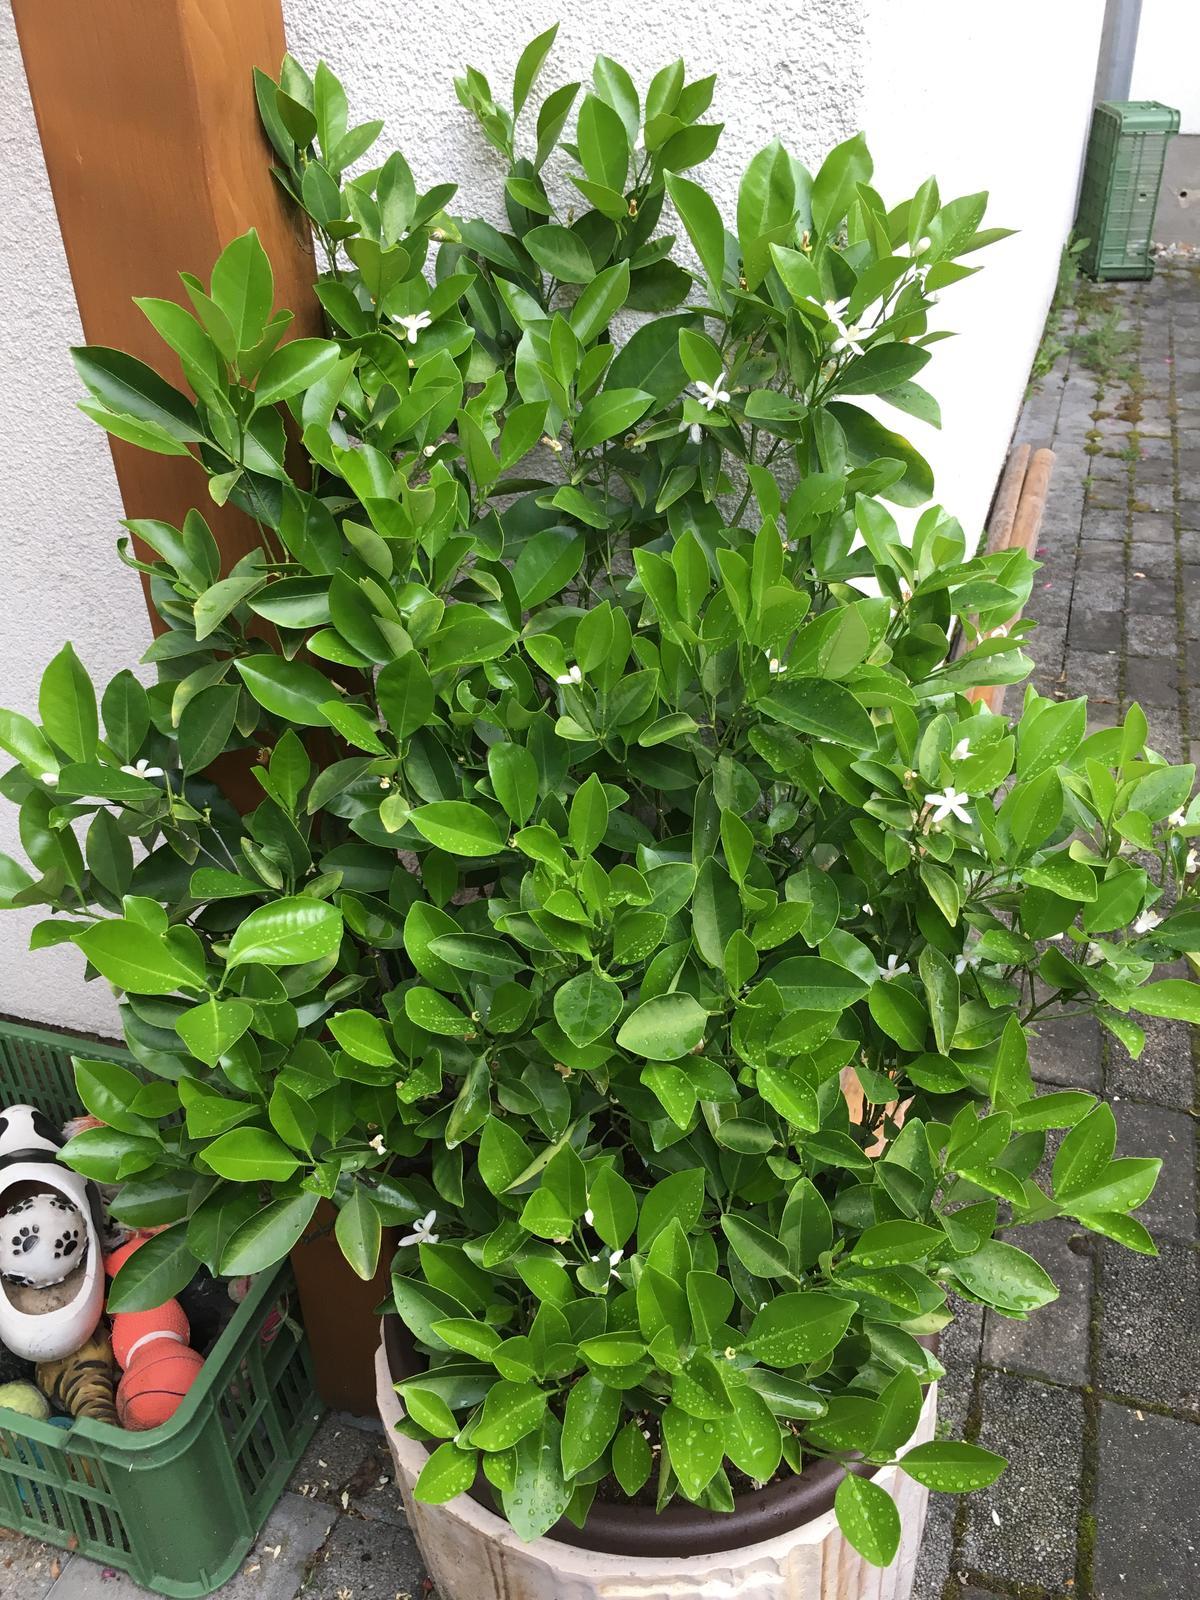 2020 😍 🌞 - Citrus tyden po aplikaci hnojiva pro subtropicke rostliny - dvakrat hustsi nez byl, krasne leskle listy a tech kvetu 😱👍🏼